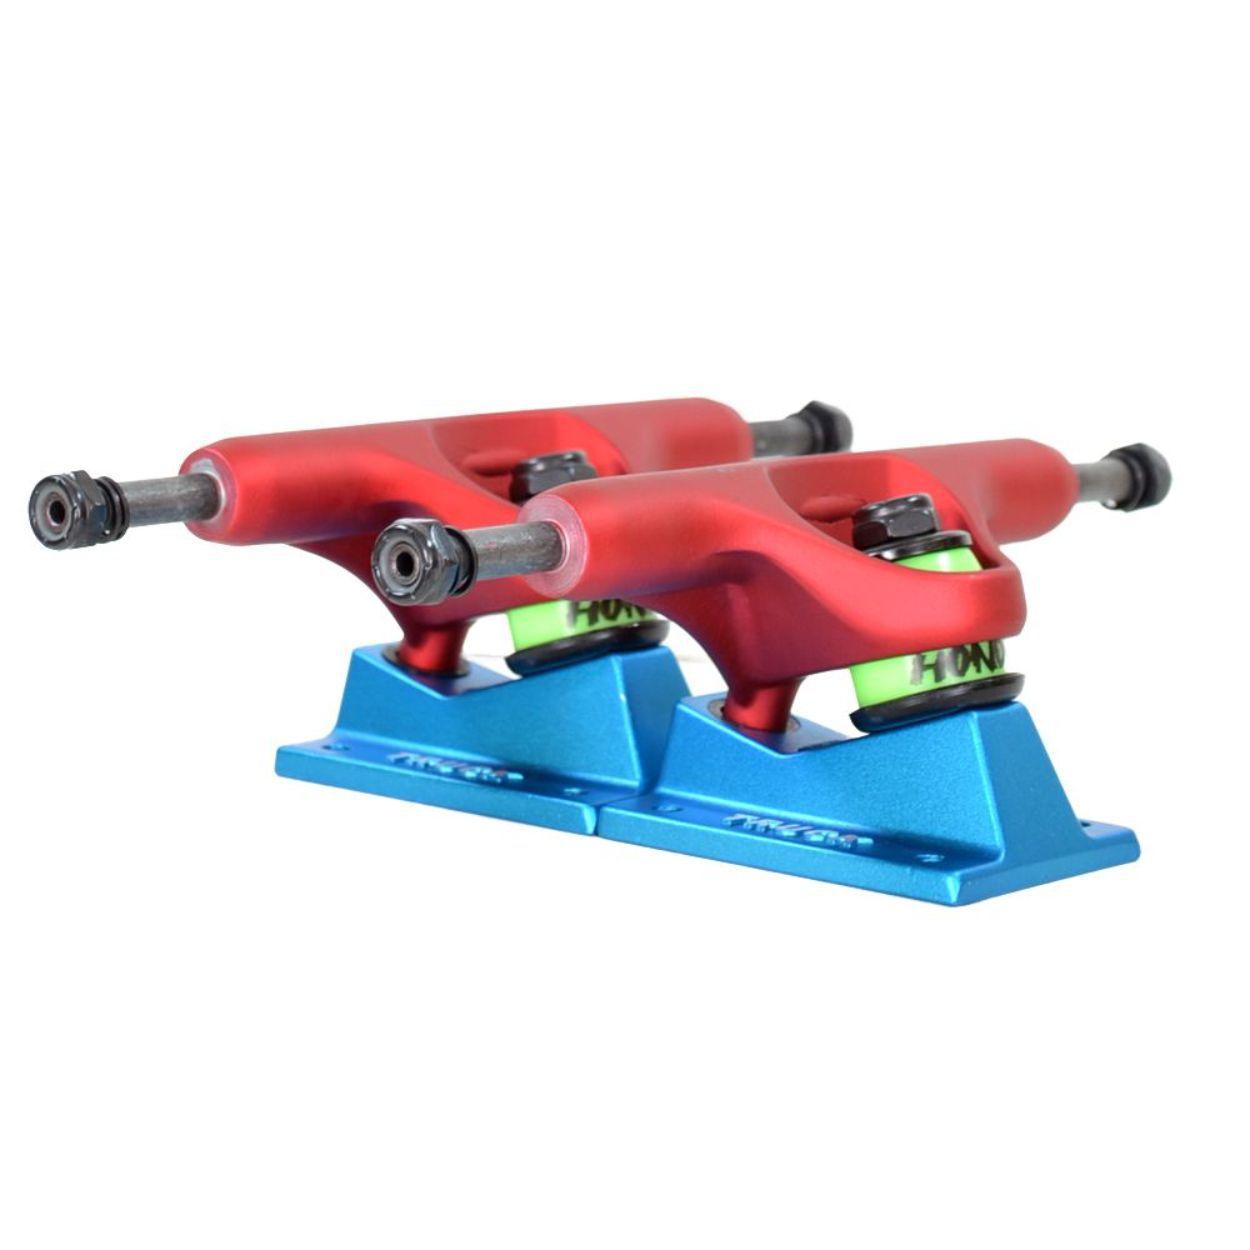 Truck Street Hondar 139mm Azul e Vermelho